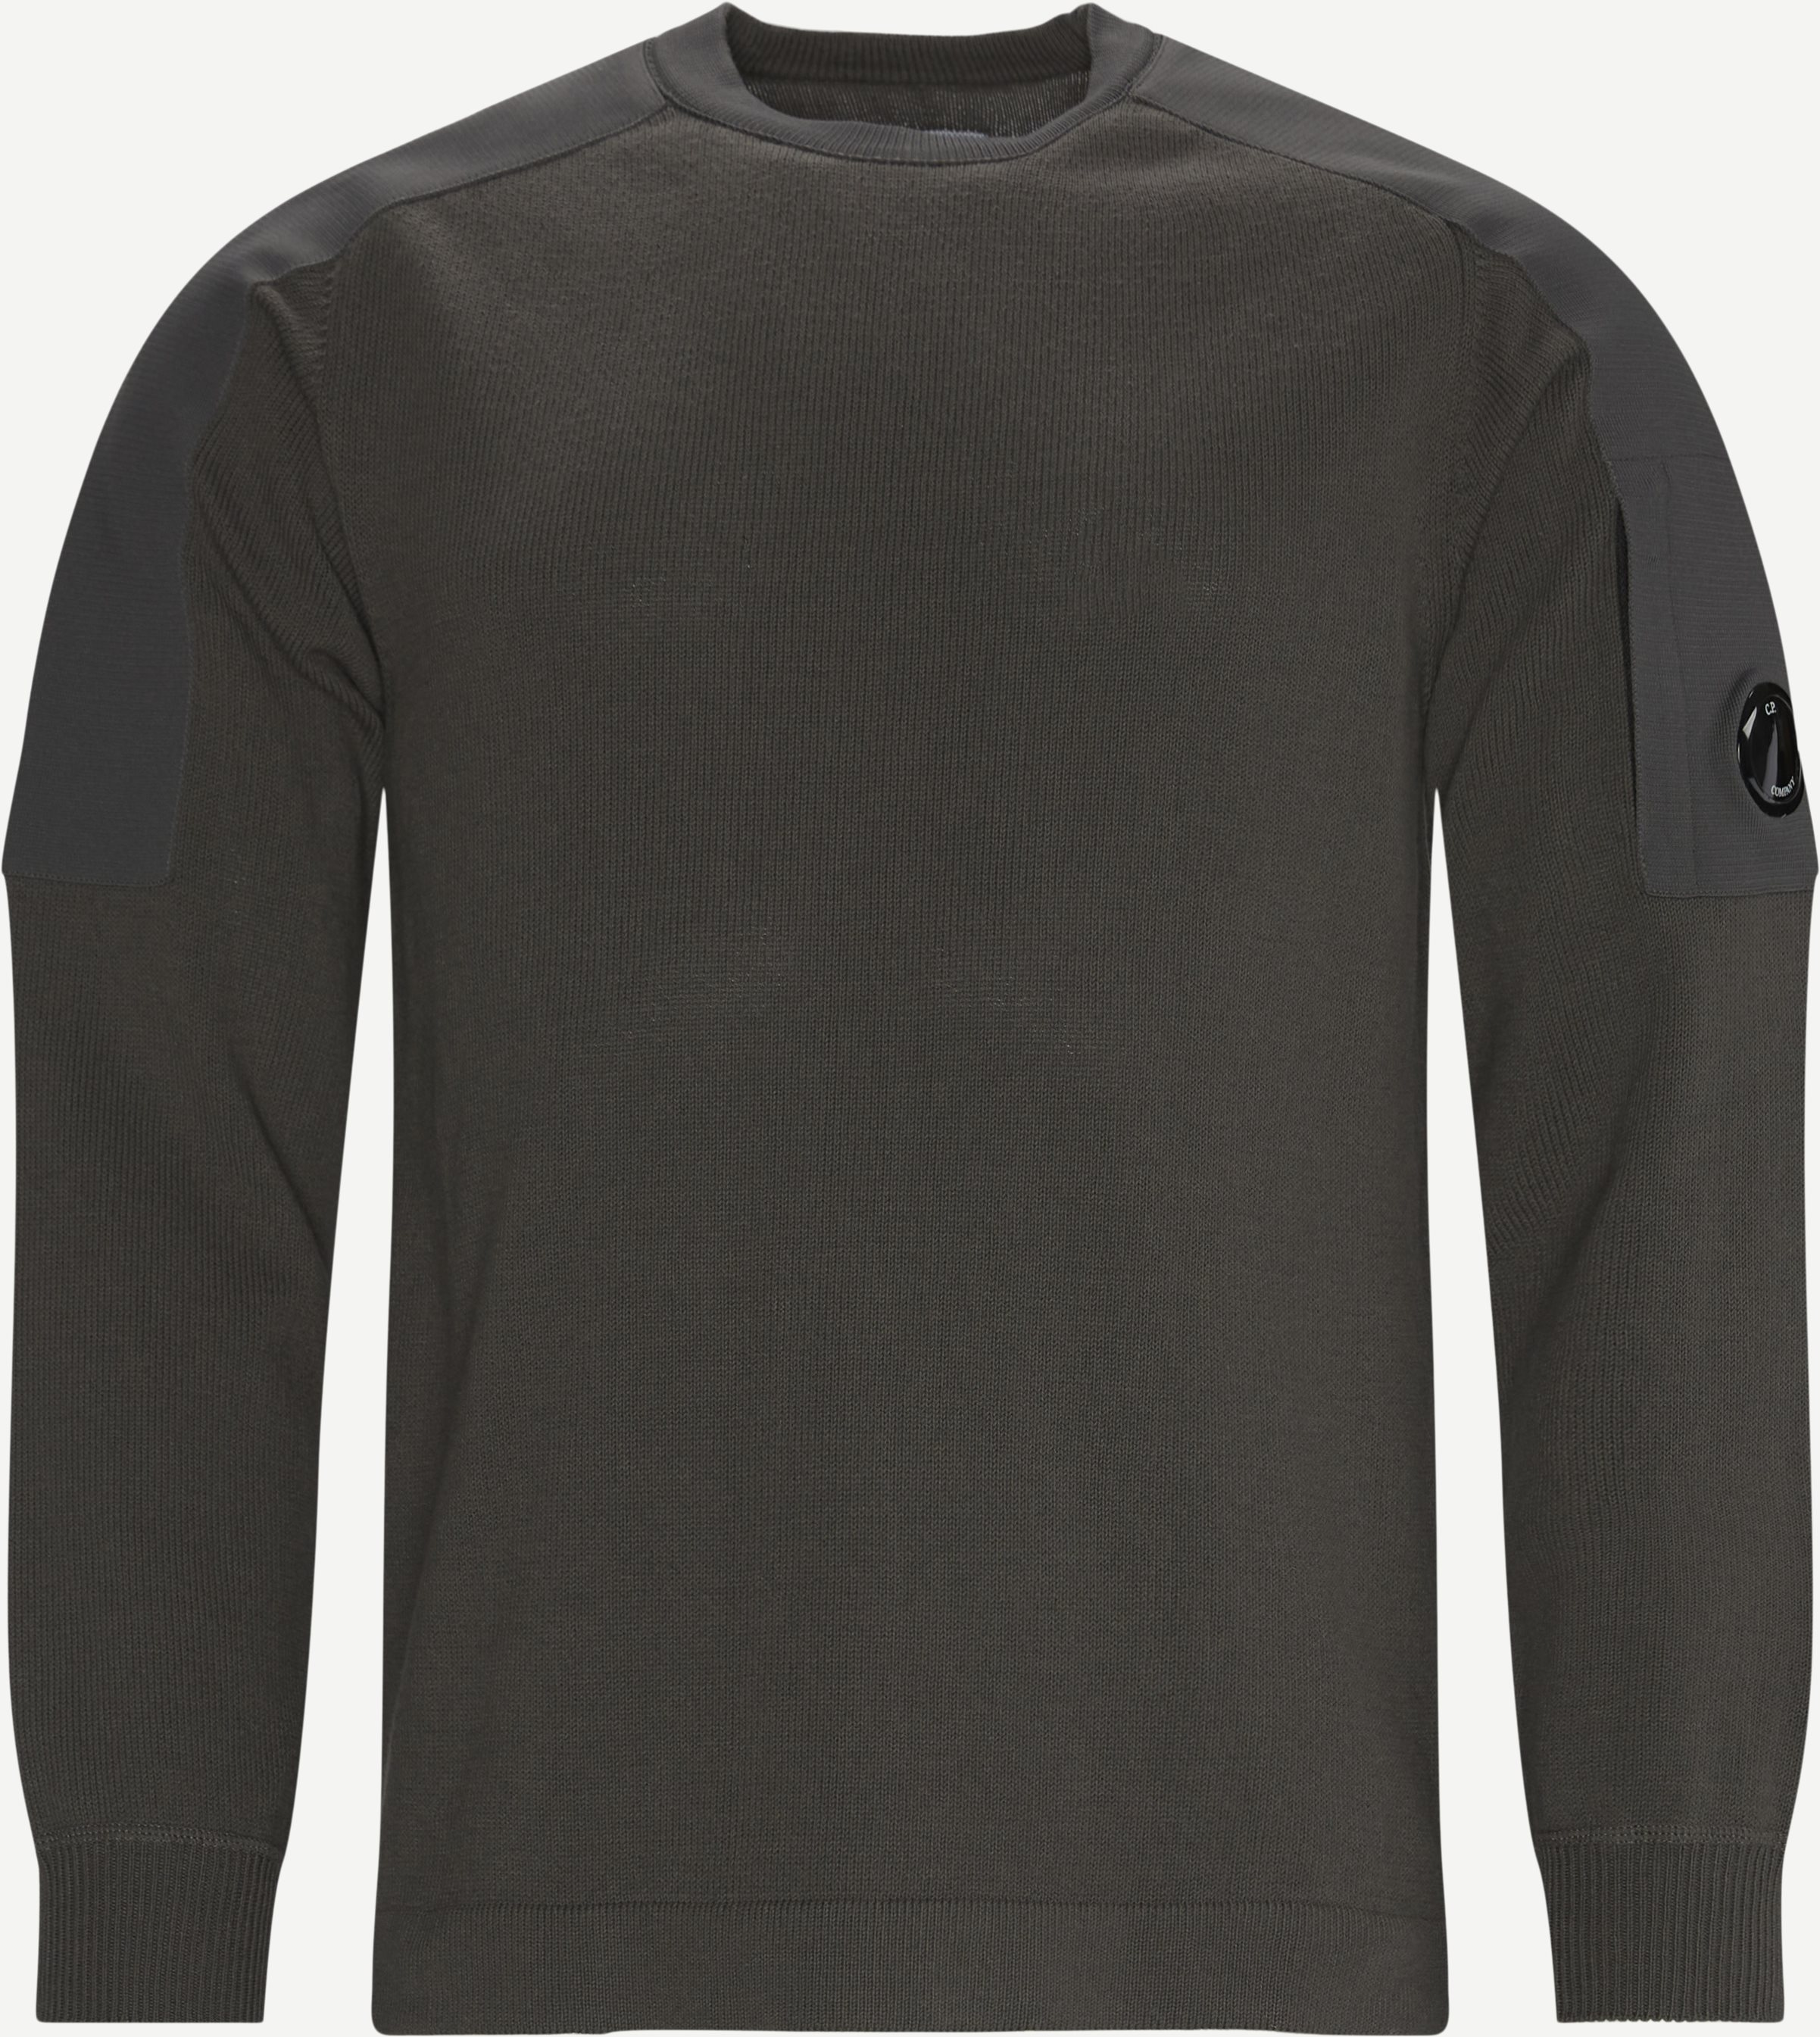 Cotton Mixed Sweater - Knitwear - Regular - Grey